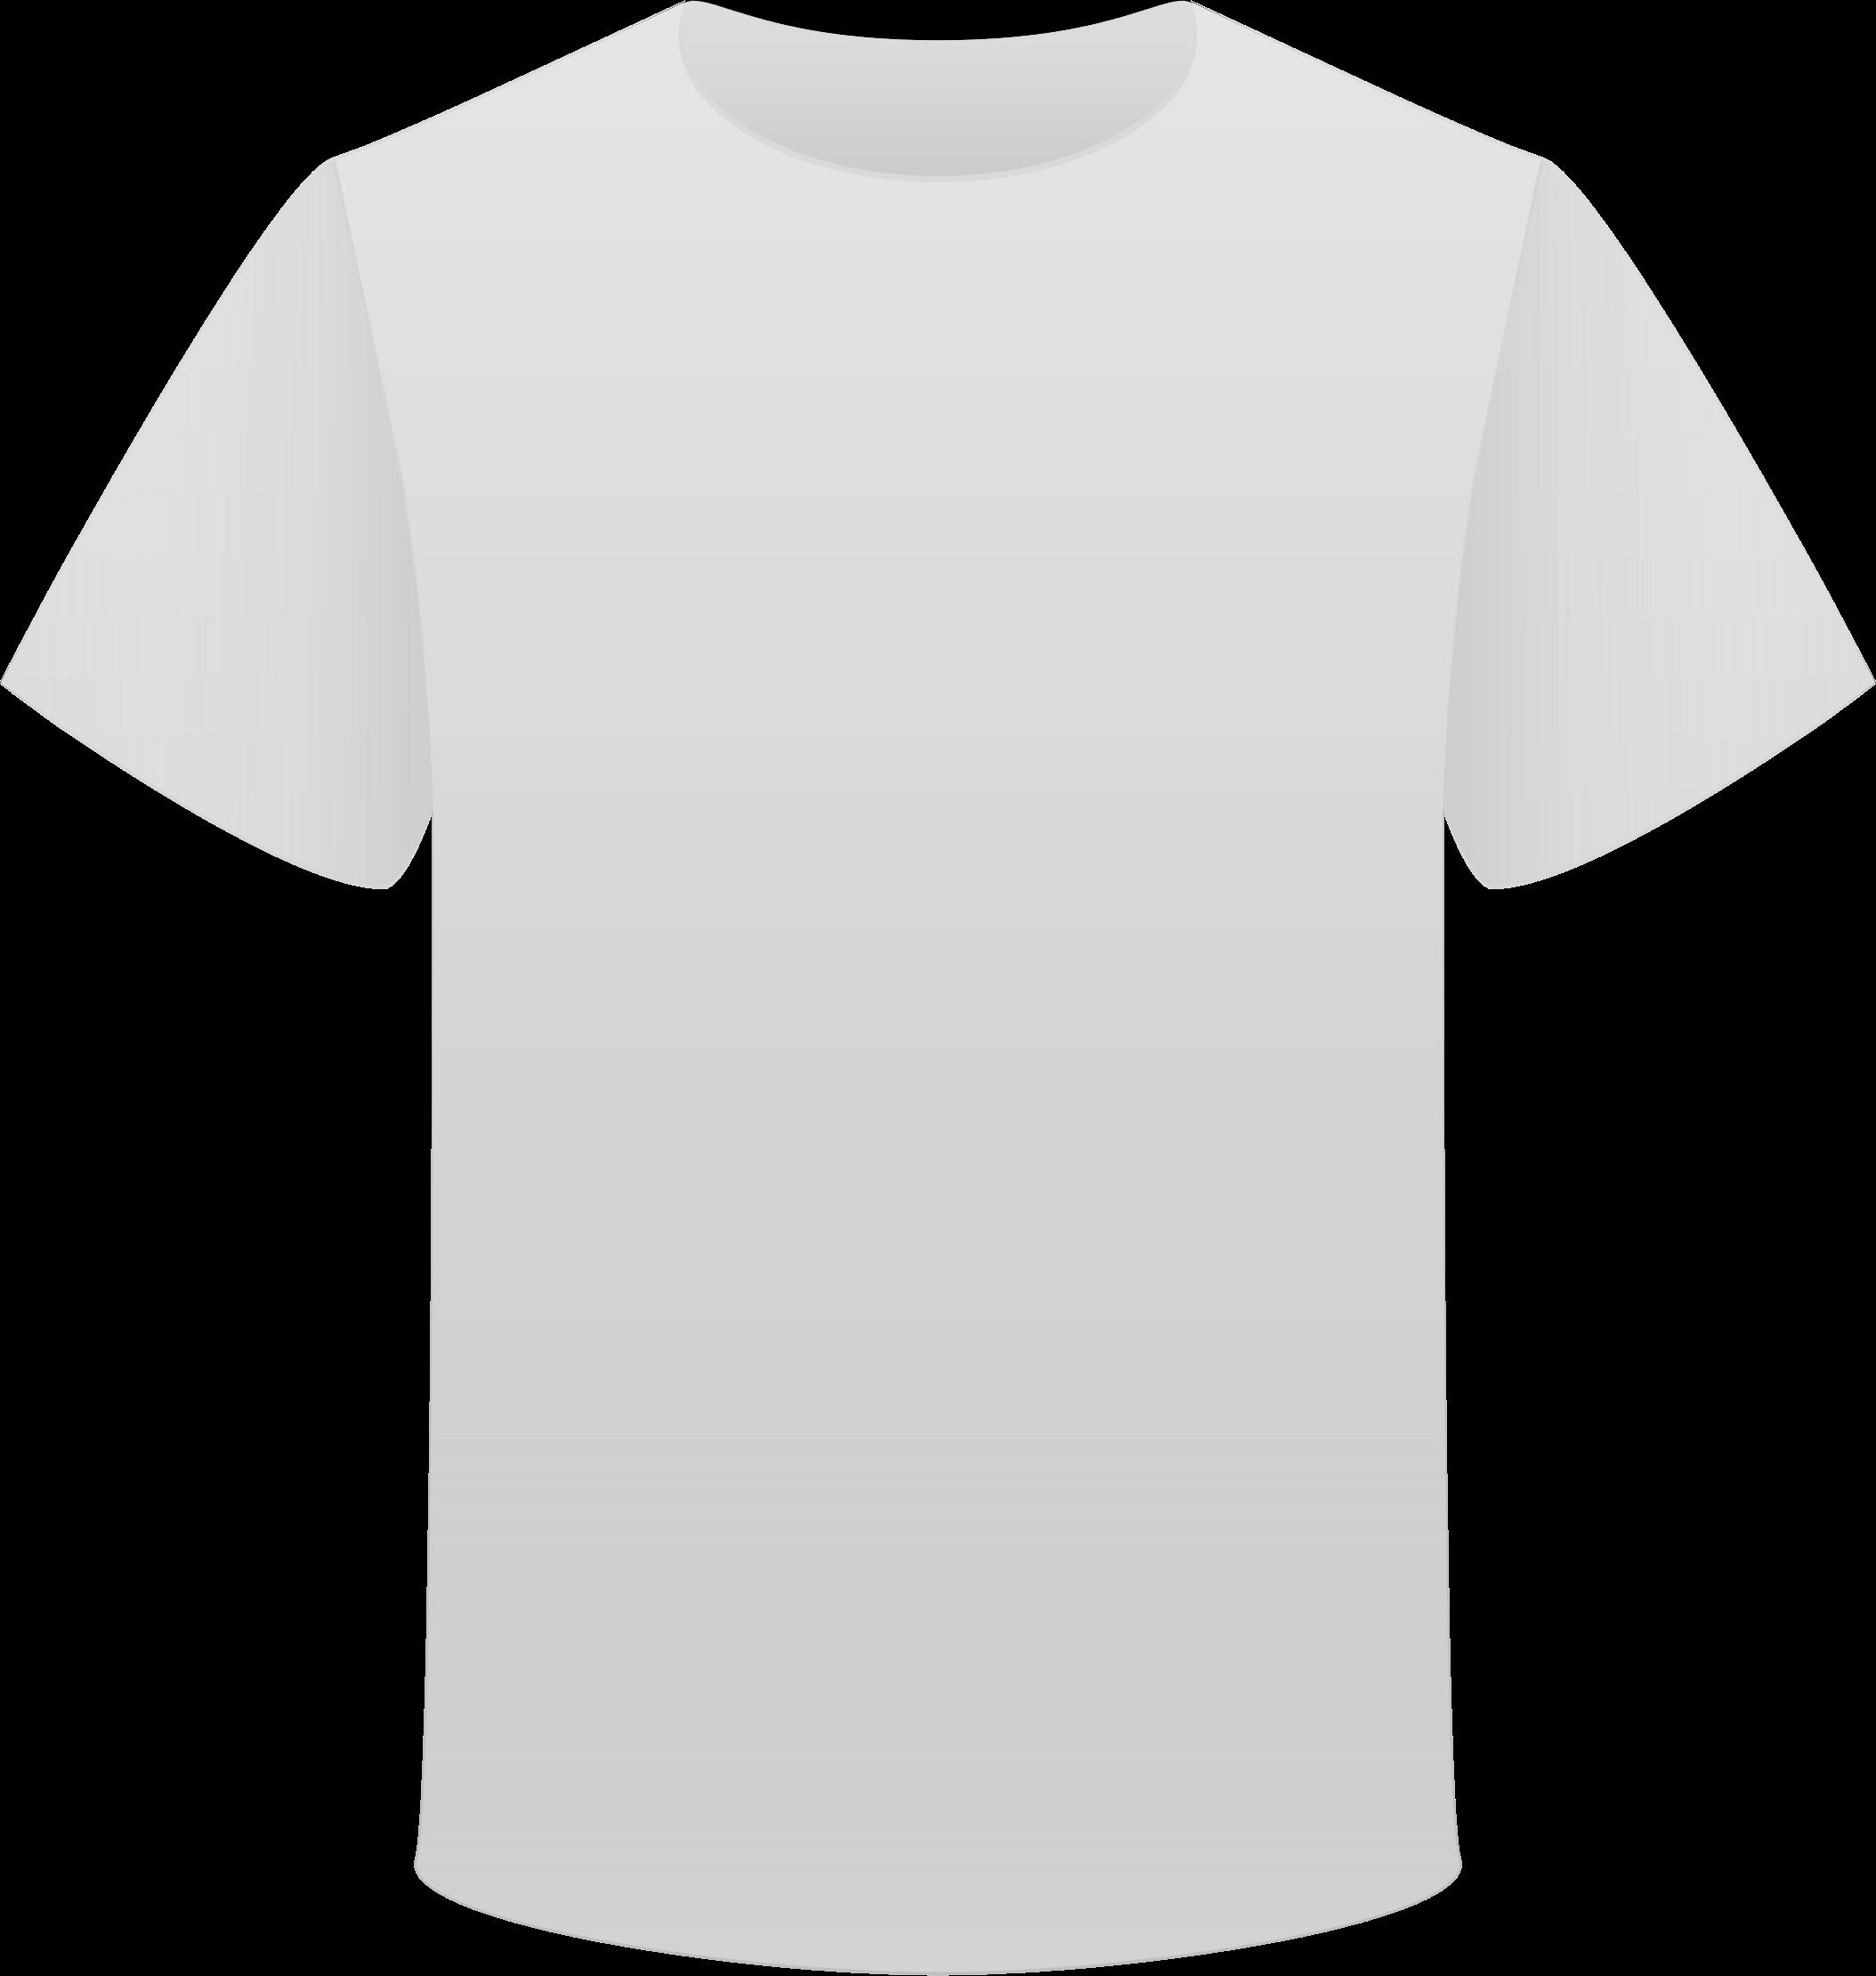 Tshirt white clipart.